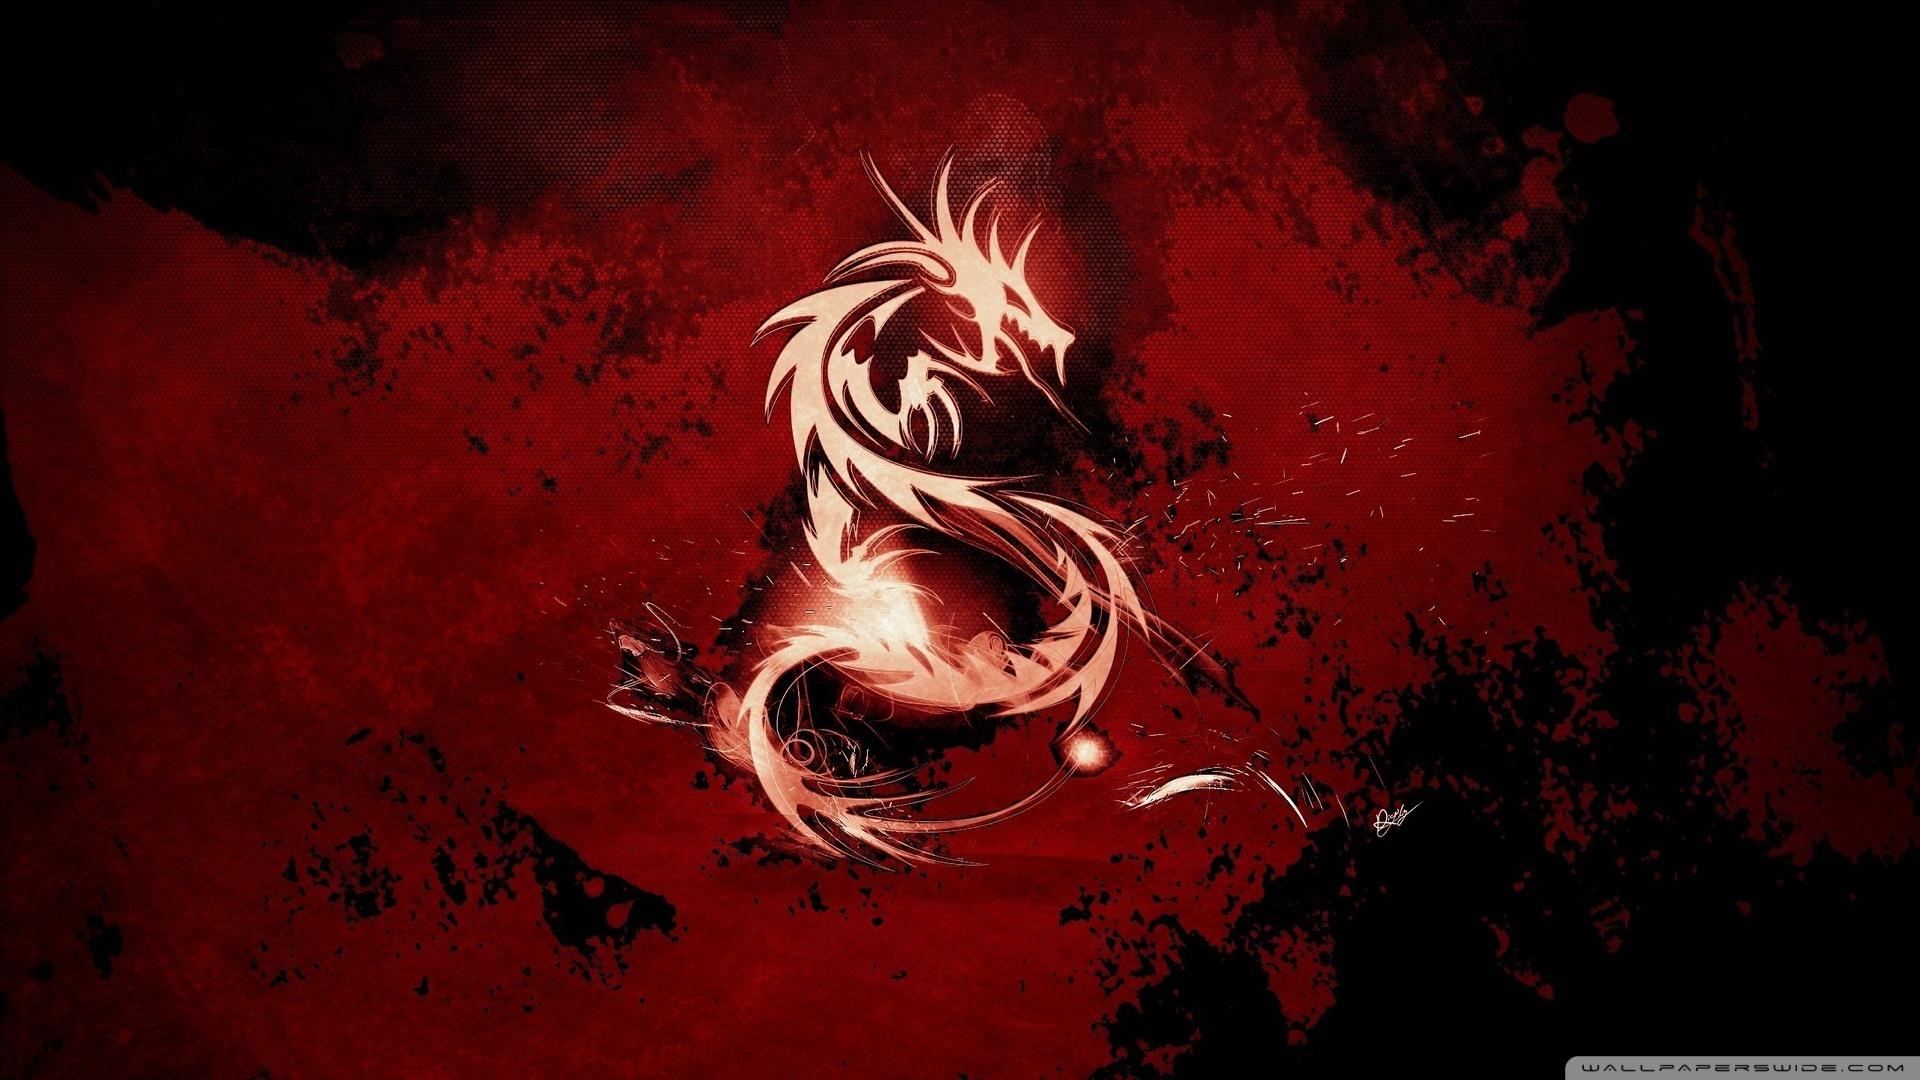 Blood Red Dragon Wallpaper 1920x1080 Blood Red Dragon 1920x1080